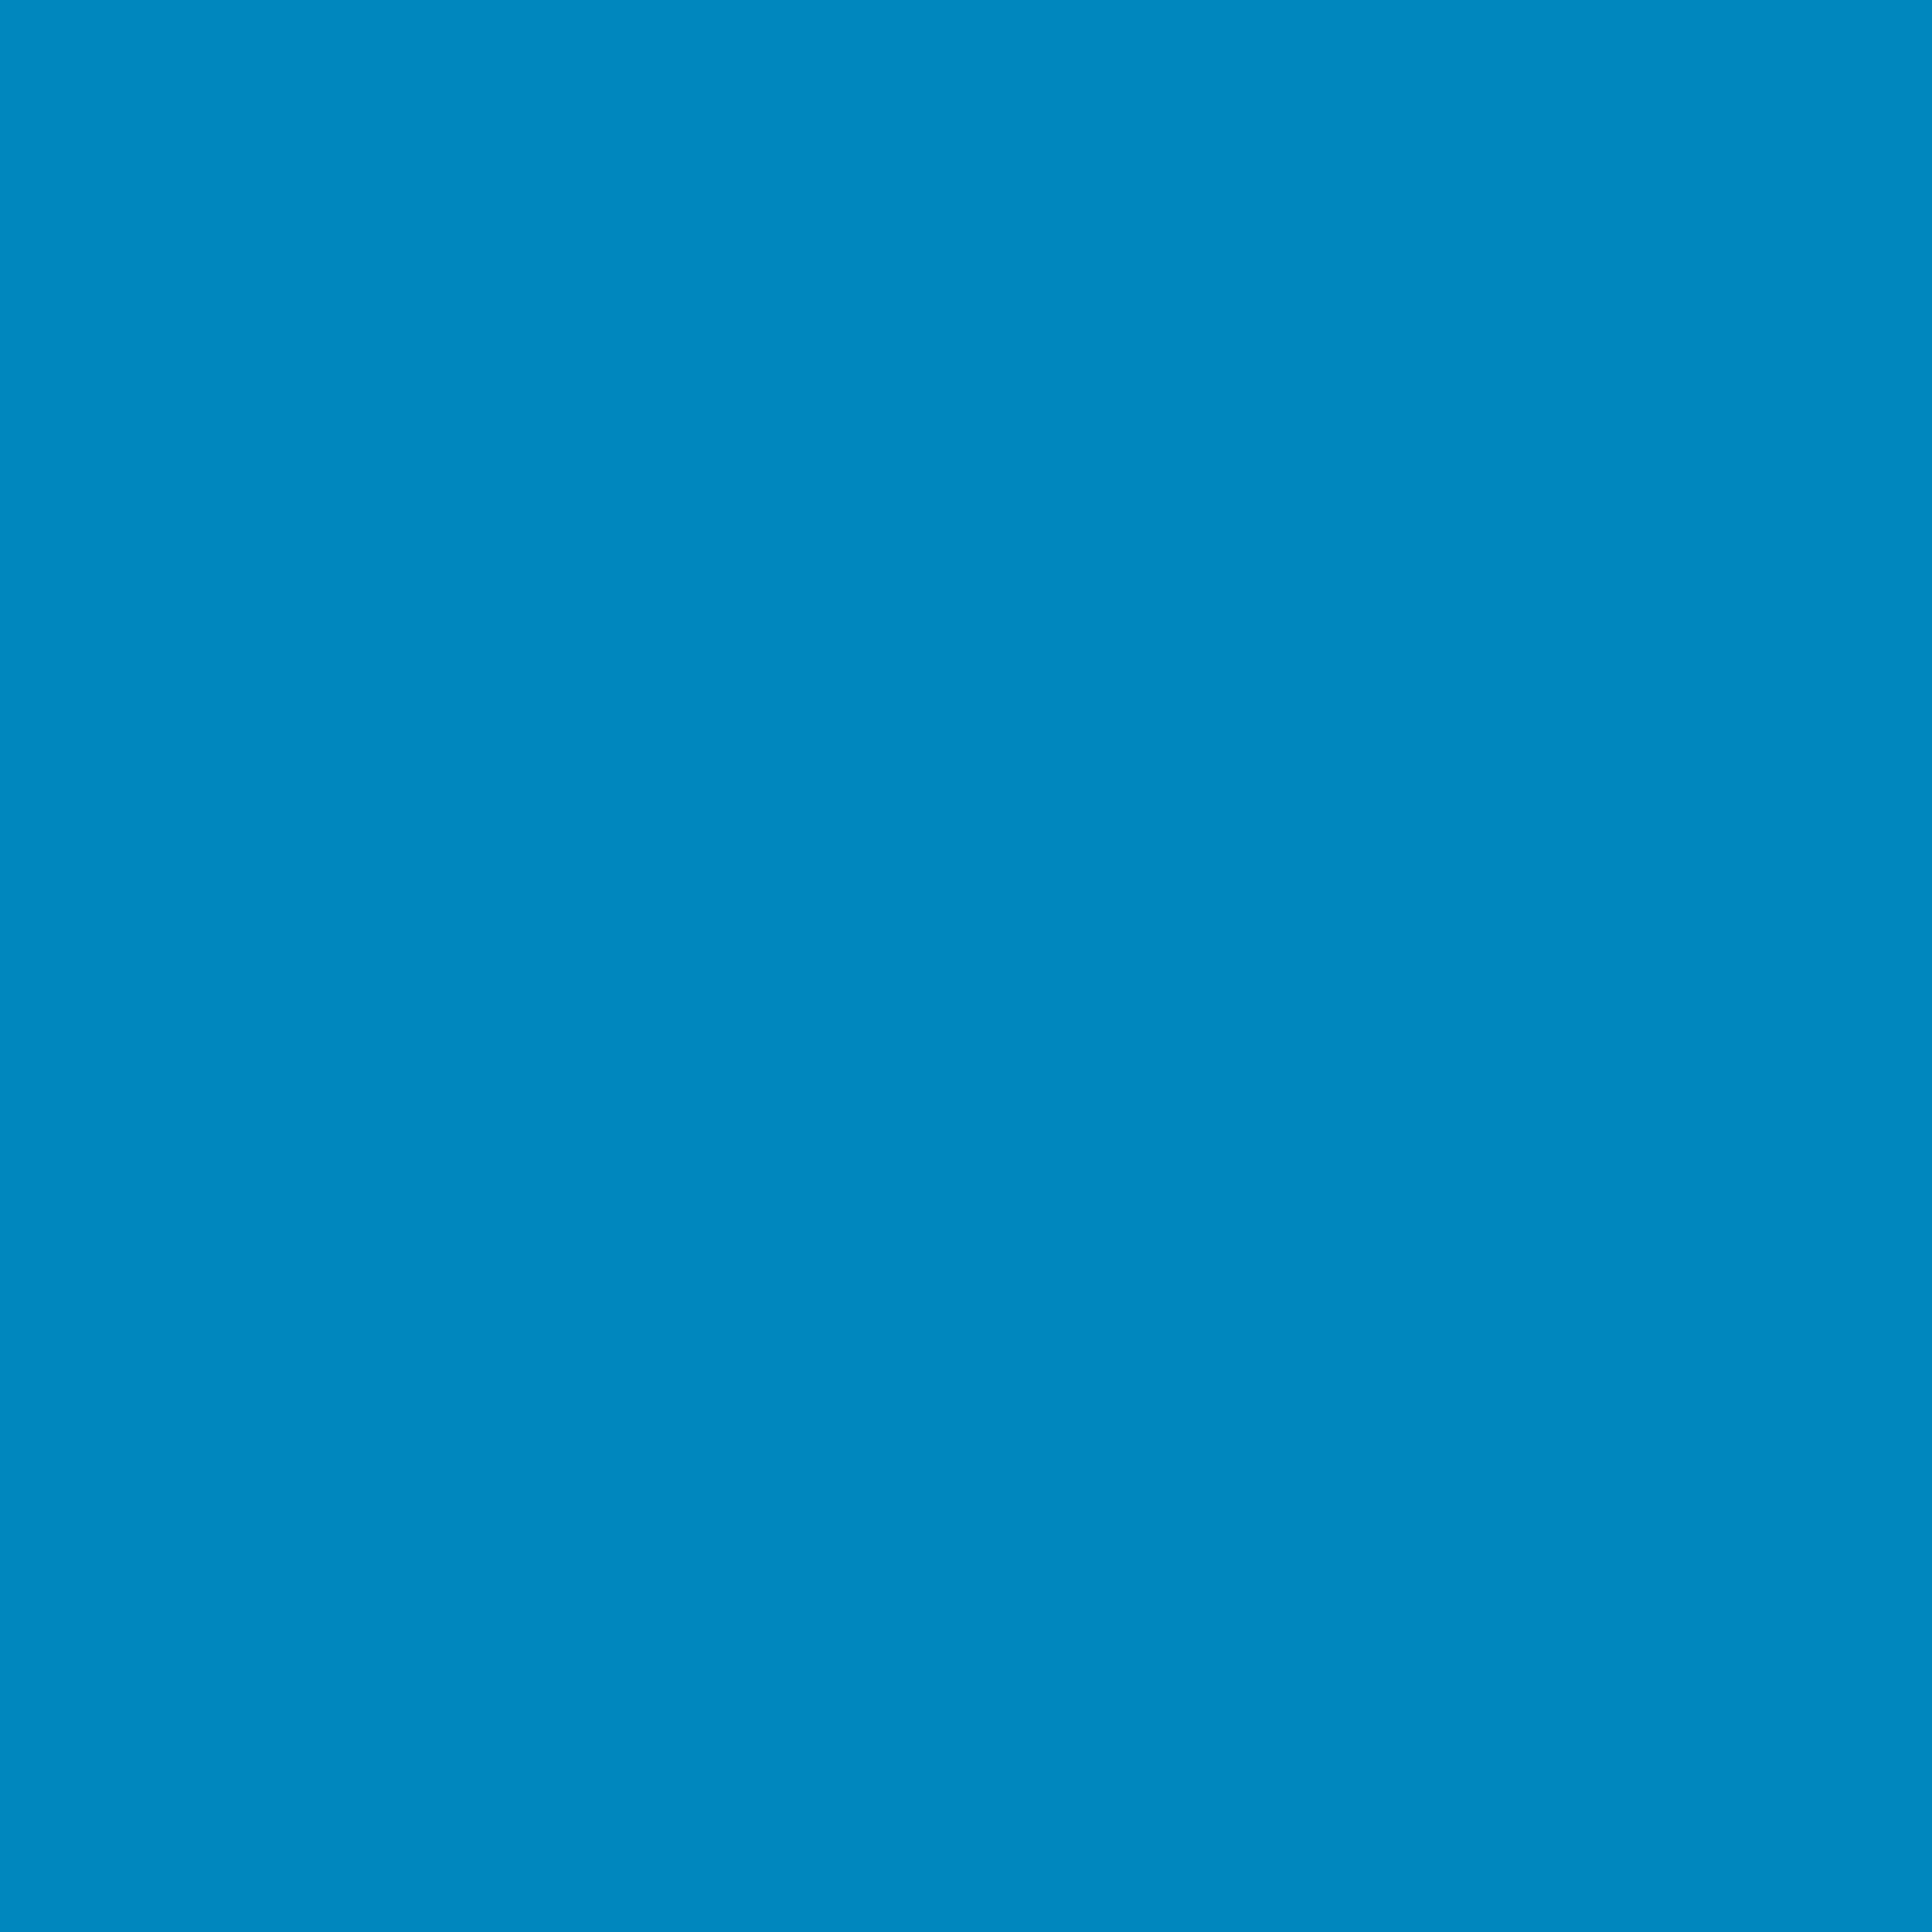 2732x2732 Blue NCS Solid Color Background